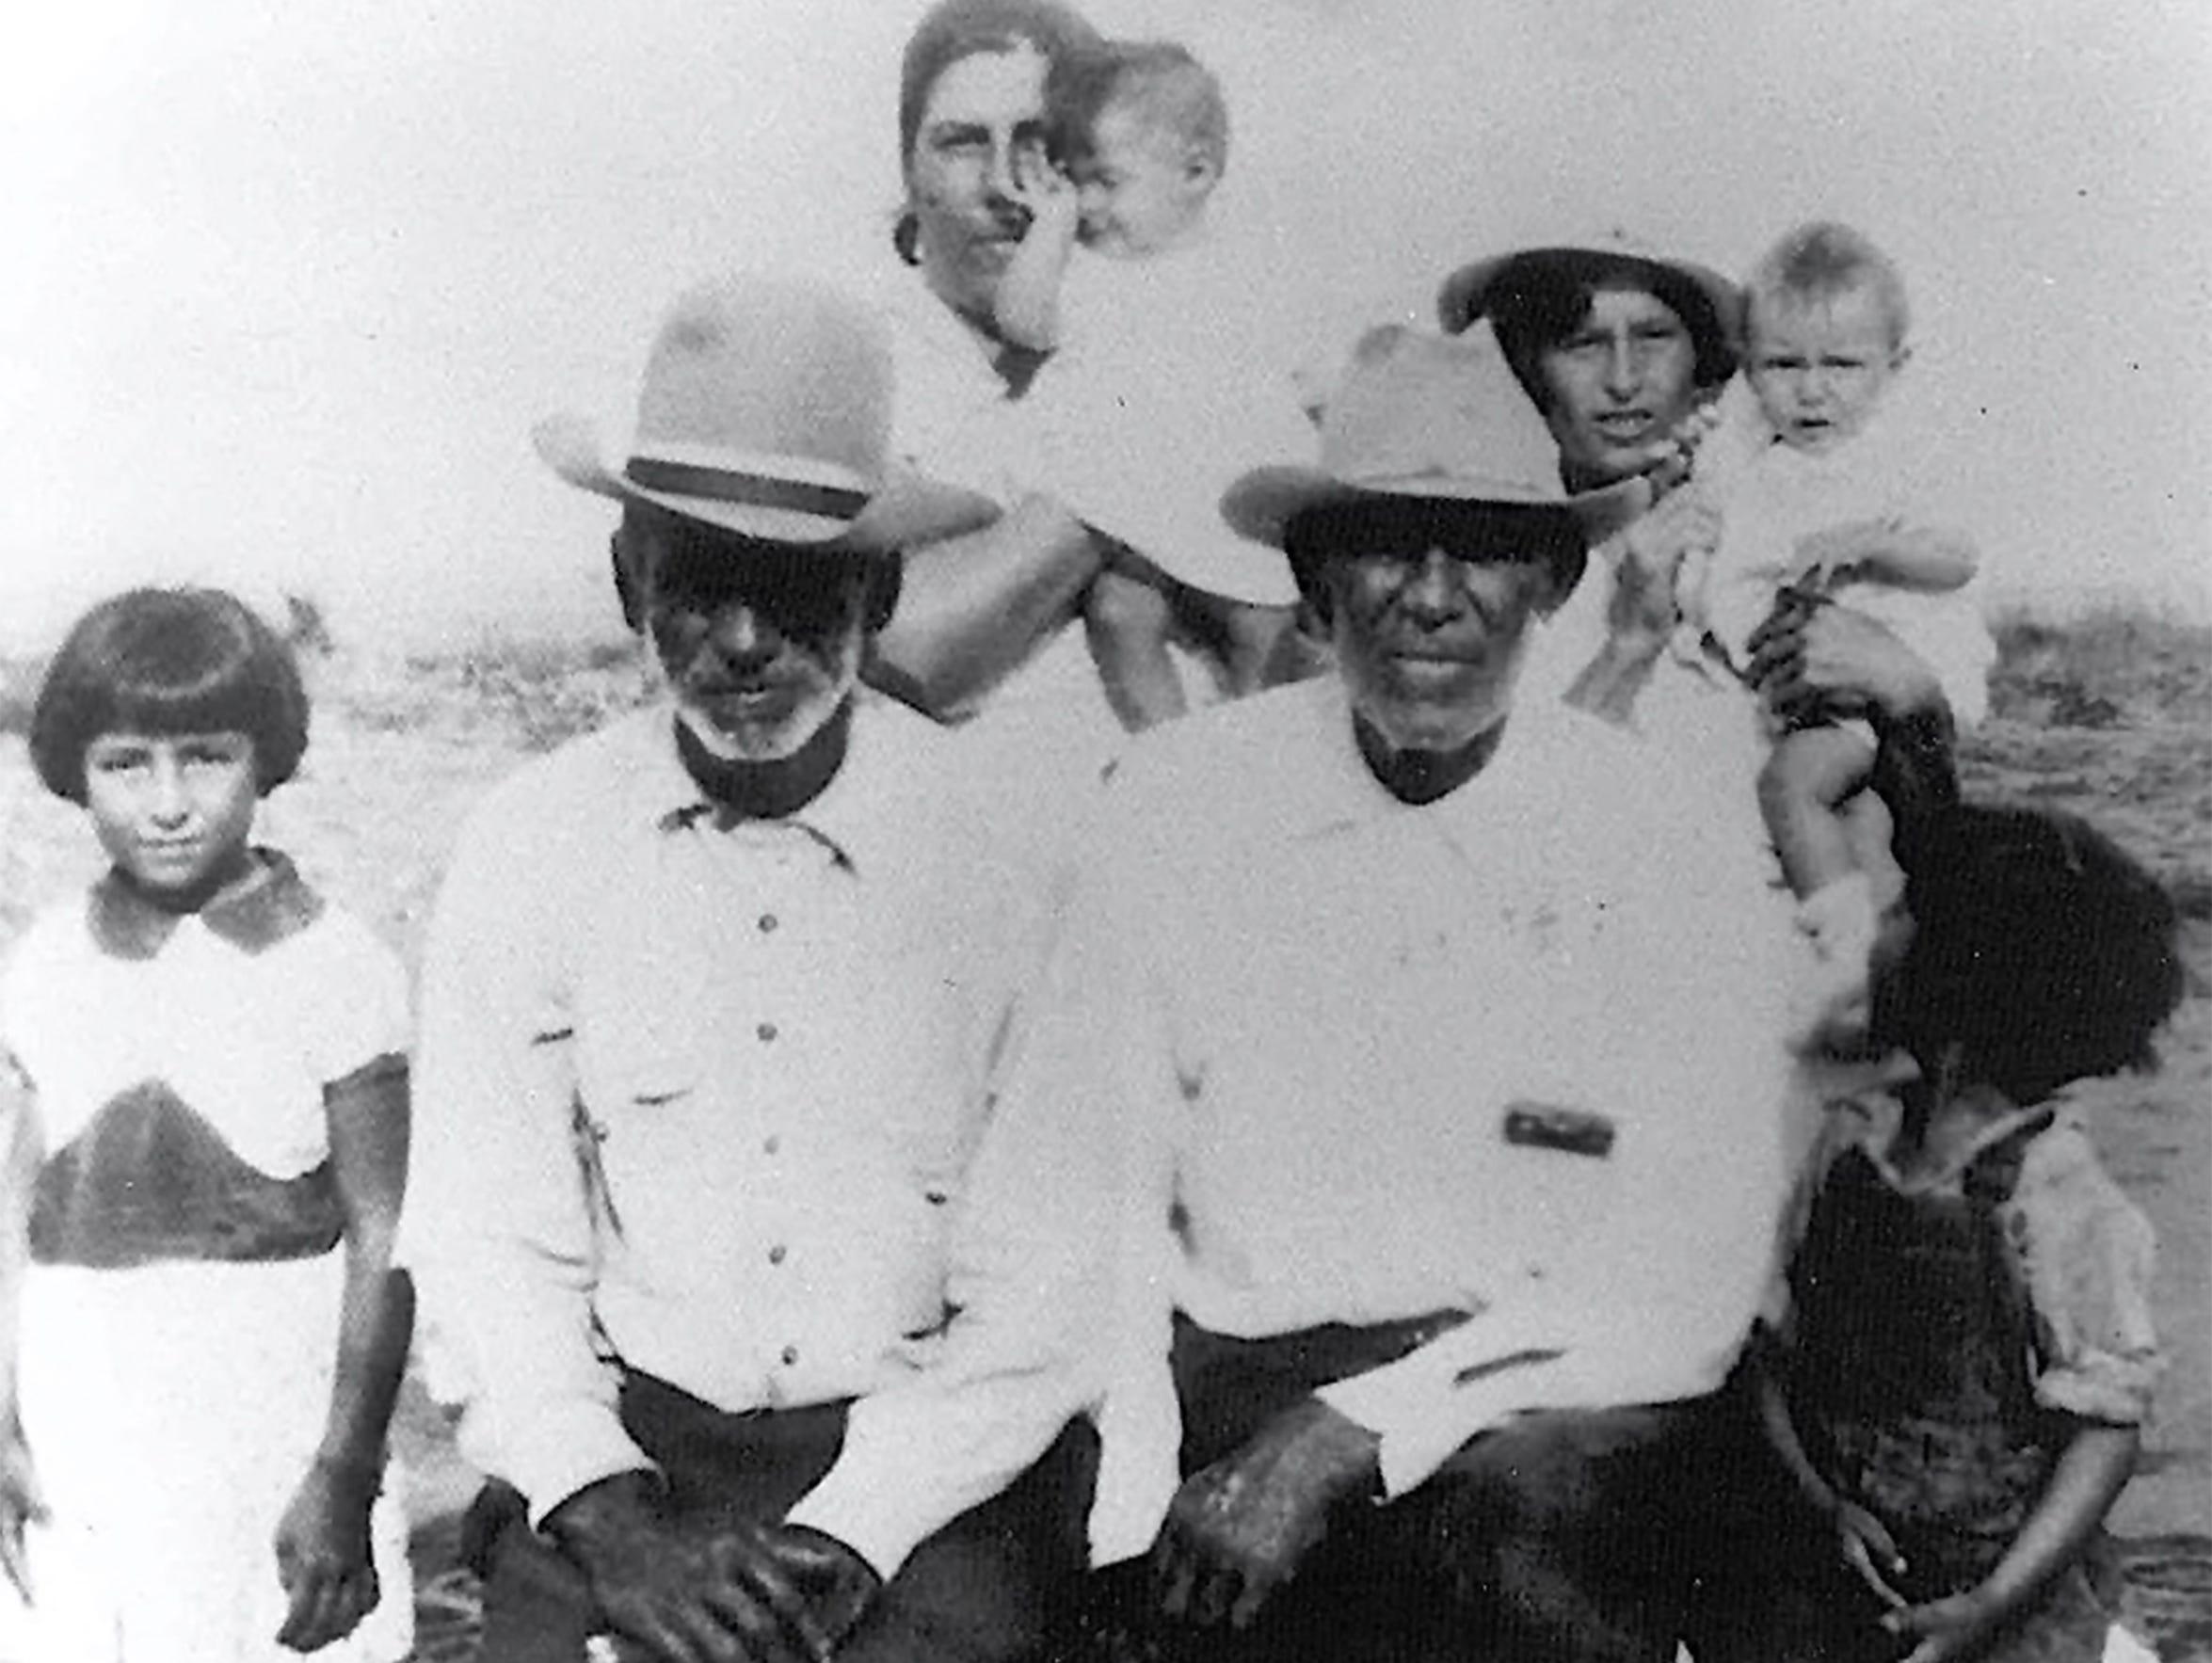 A family photo shows Arlinda Valencia's grandfather,